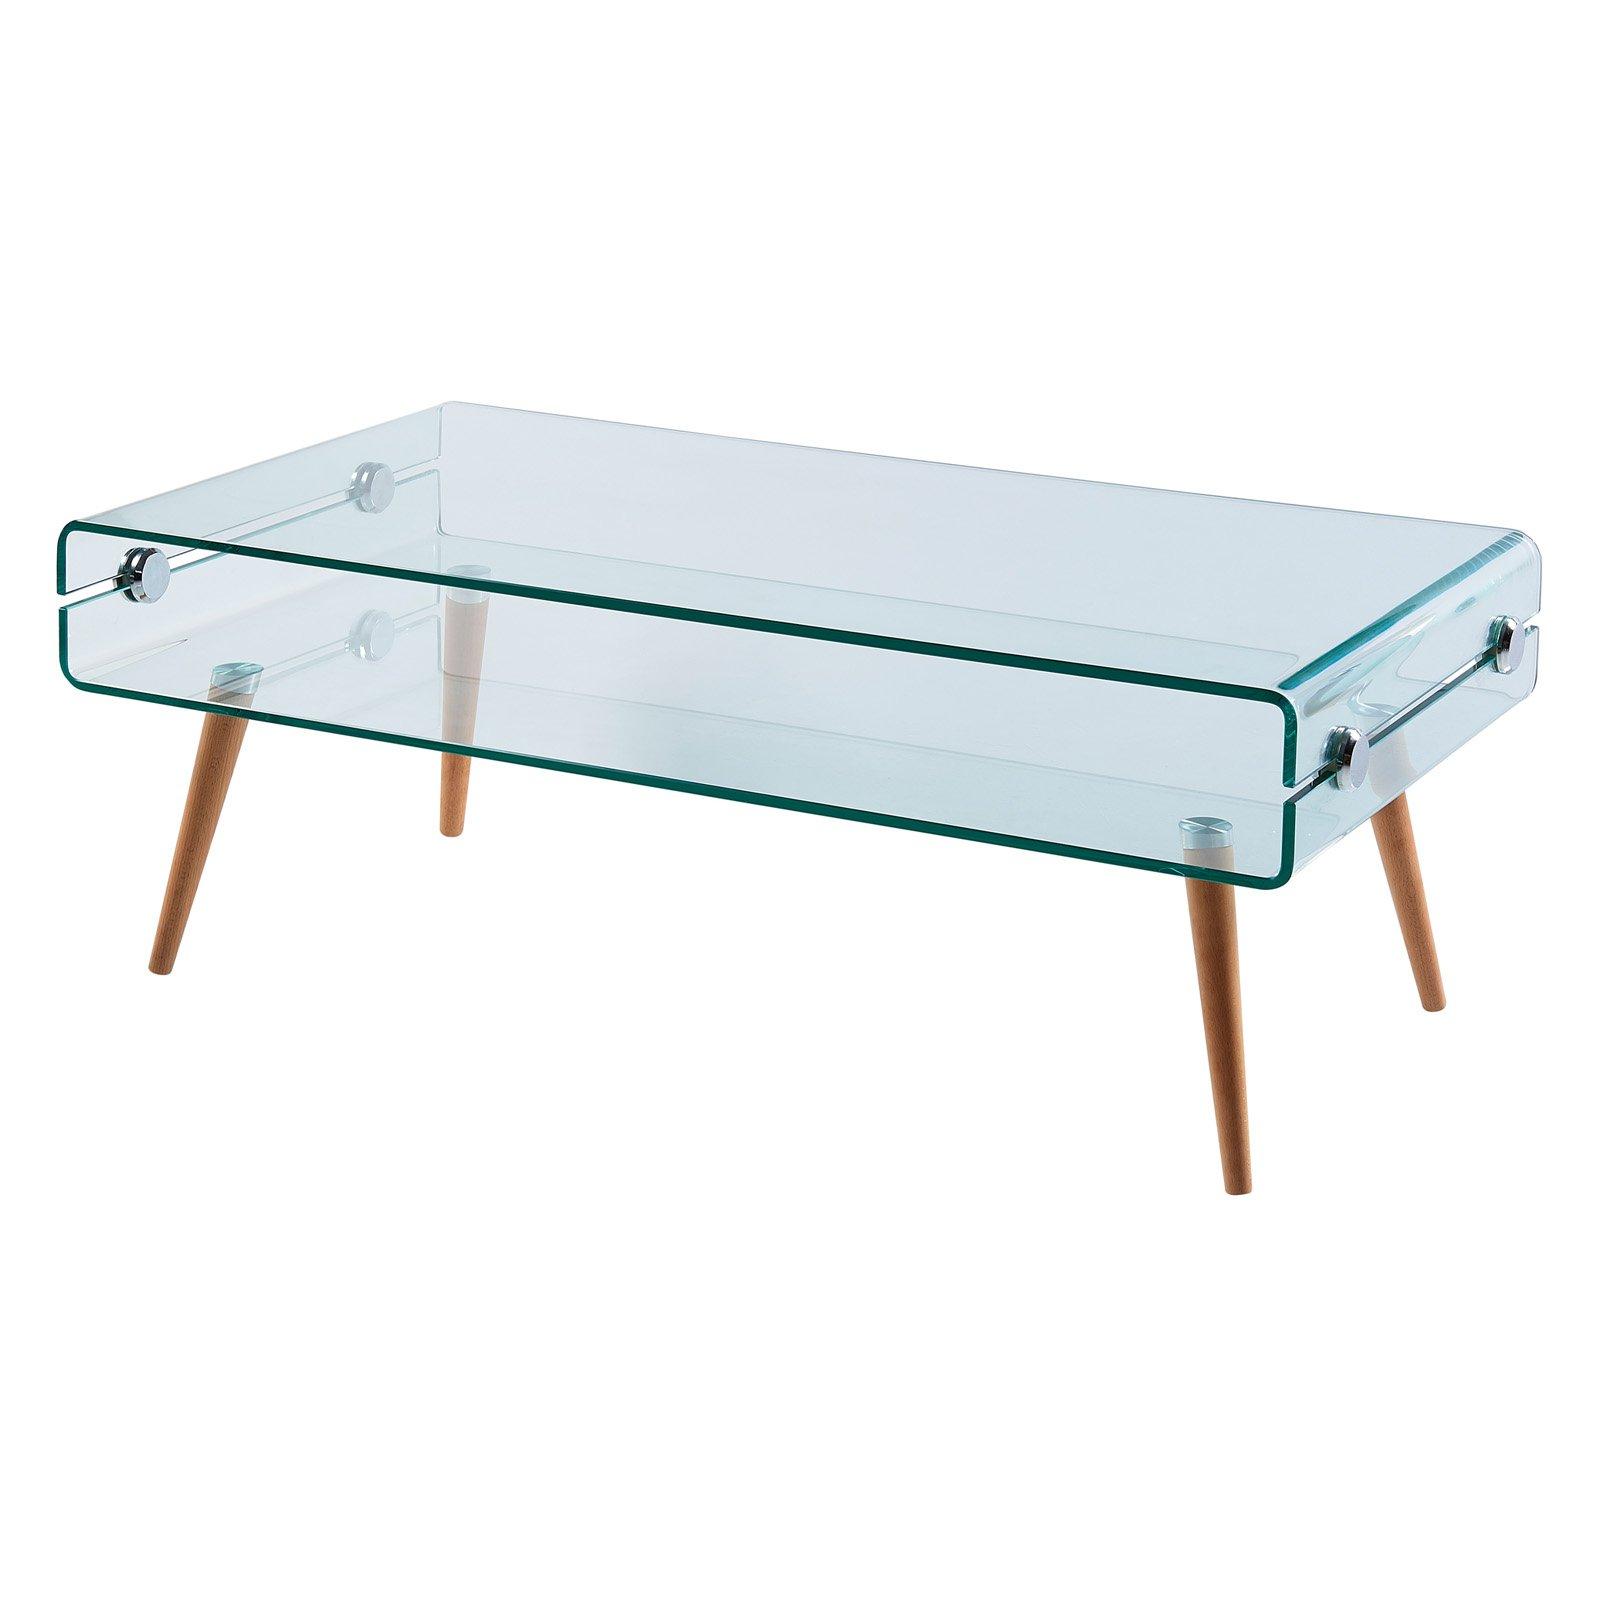 Versanora Cassetto Glass Coffee Table Huis [ 1600 x 1600 Pixel ]